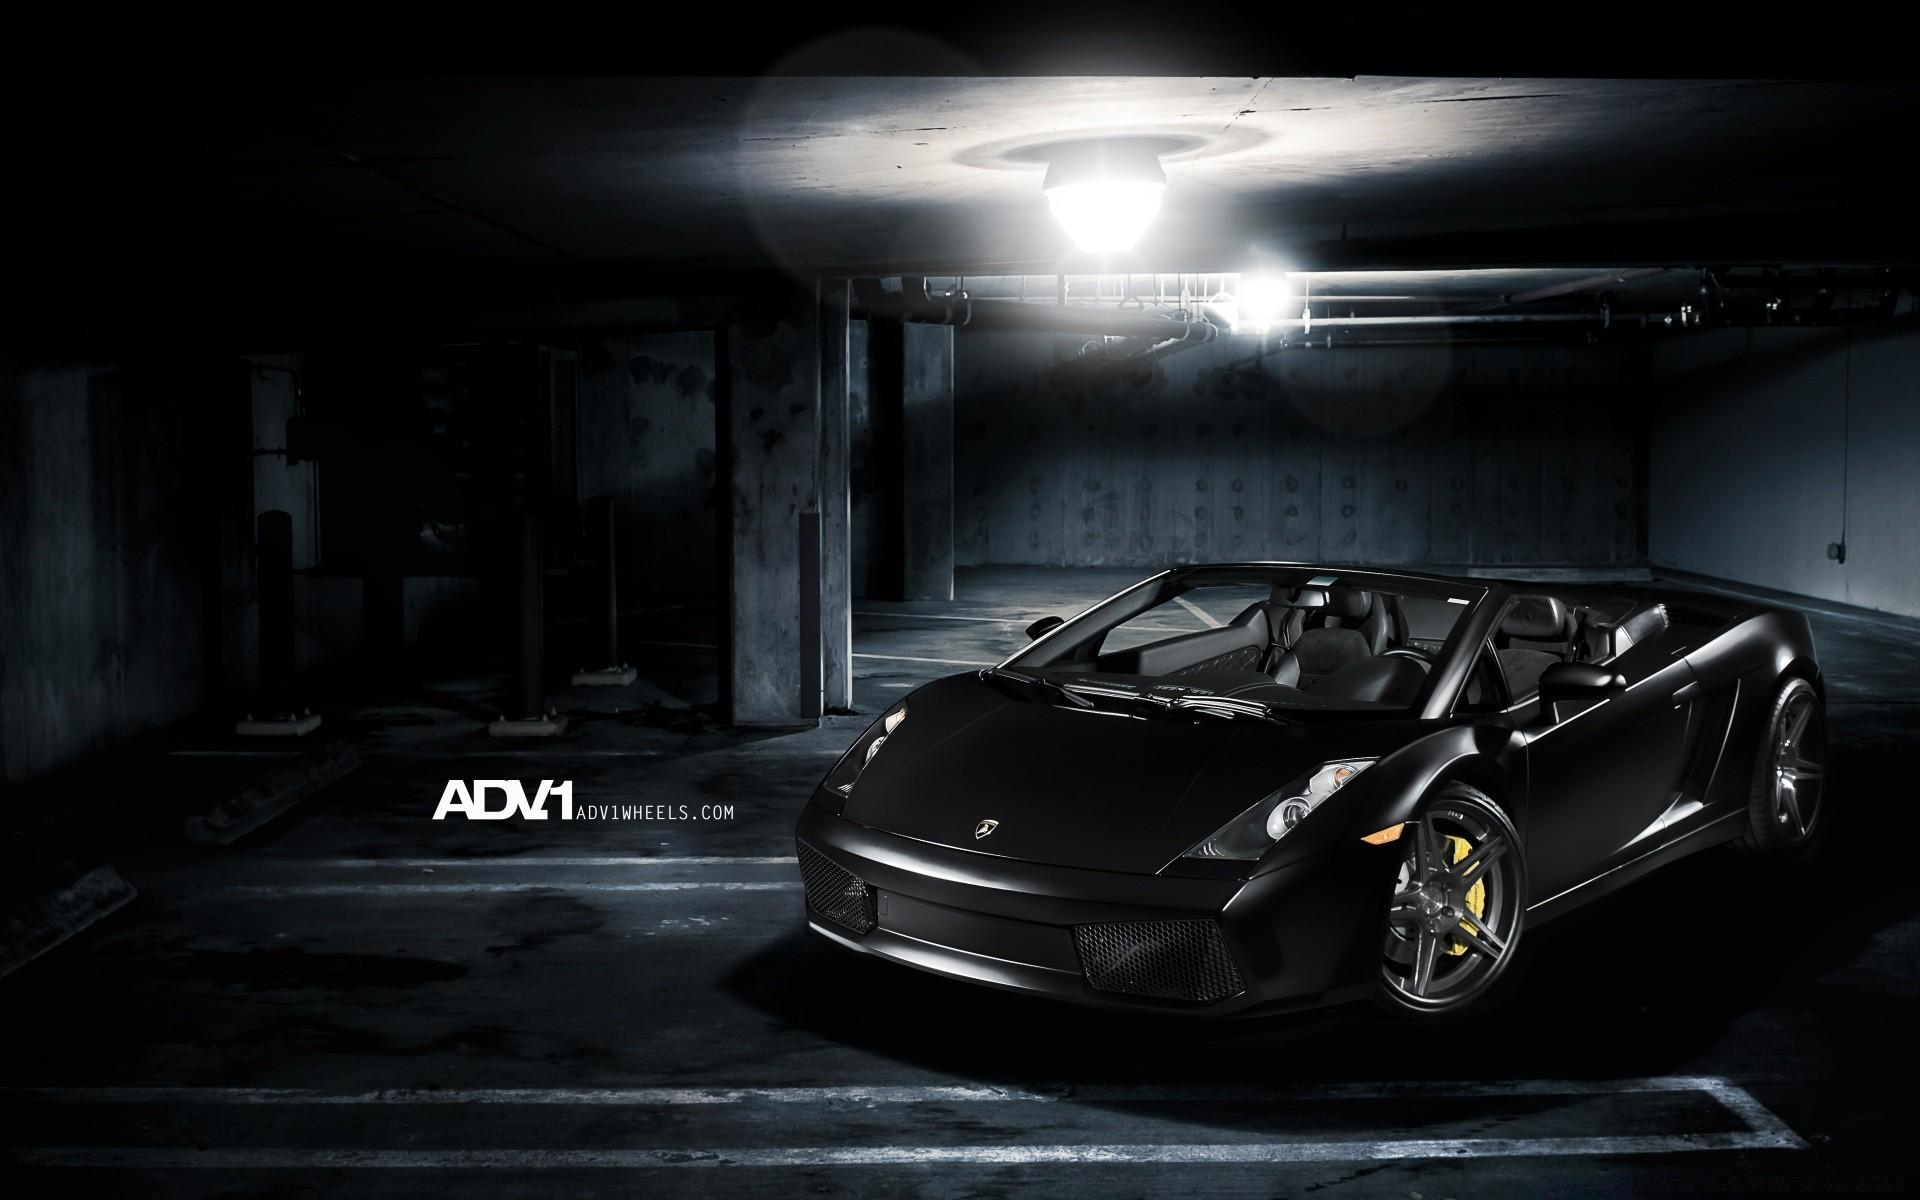 ADV1 Matte Black Lamborghini Gallardo Spyder IPhone Wallpapers For Free